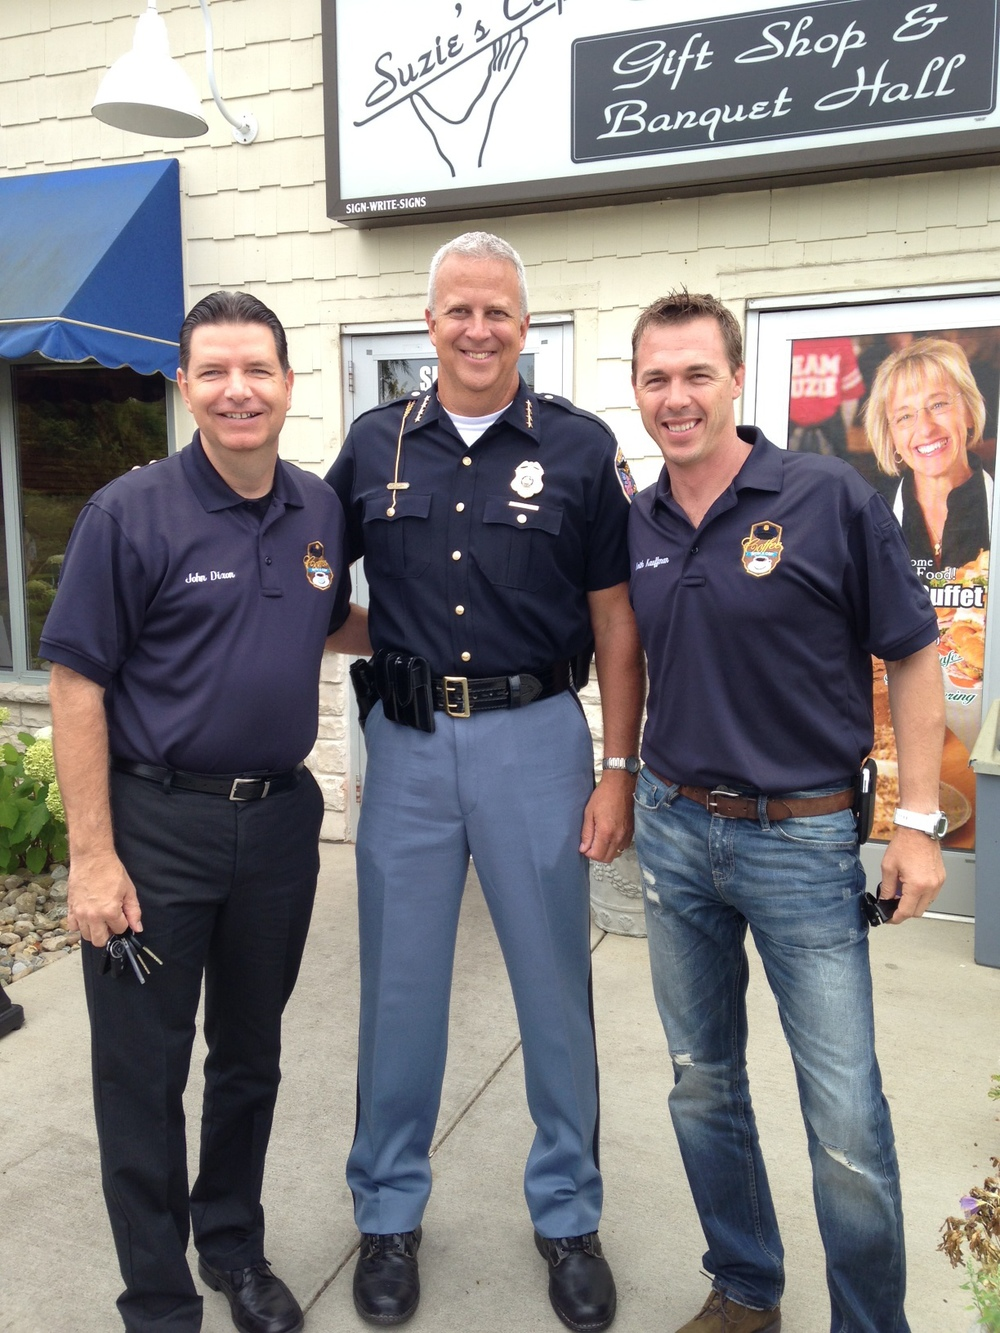 Detective Dixon, Chief  Michael Brickner , Captain Kauffman, Valparaiso, Indiana